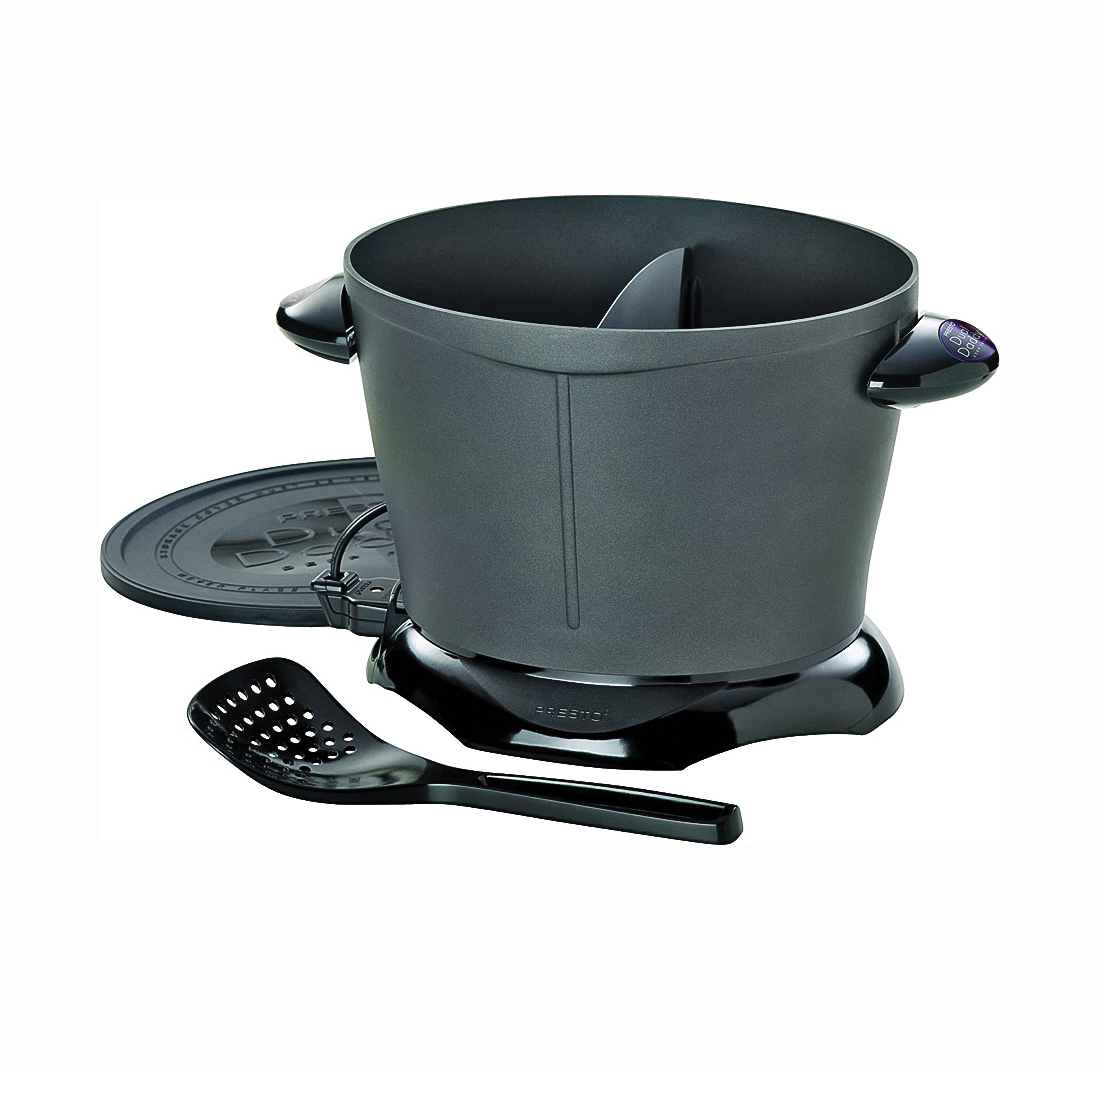 Picture of Presto DualDaddy 05450 Electric Deep Fryer